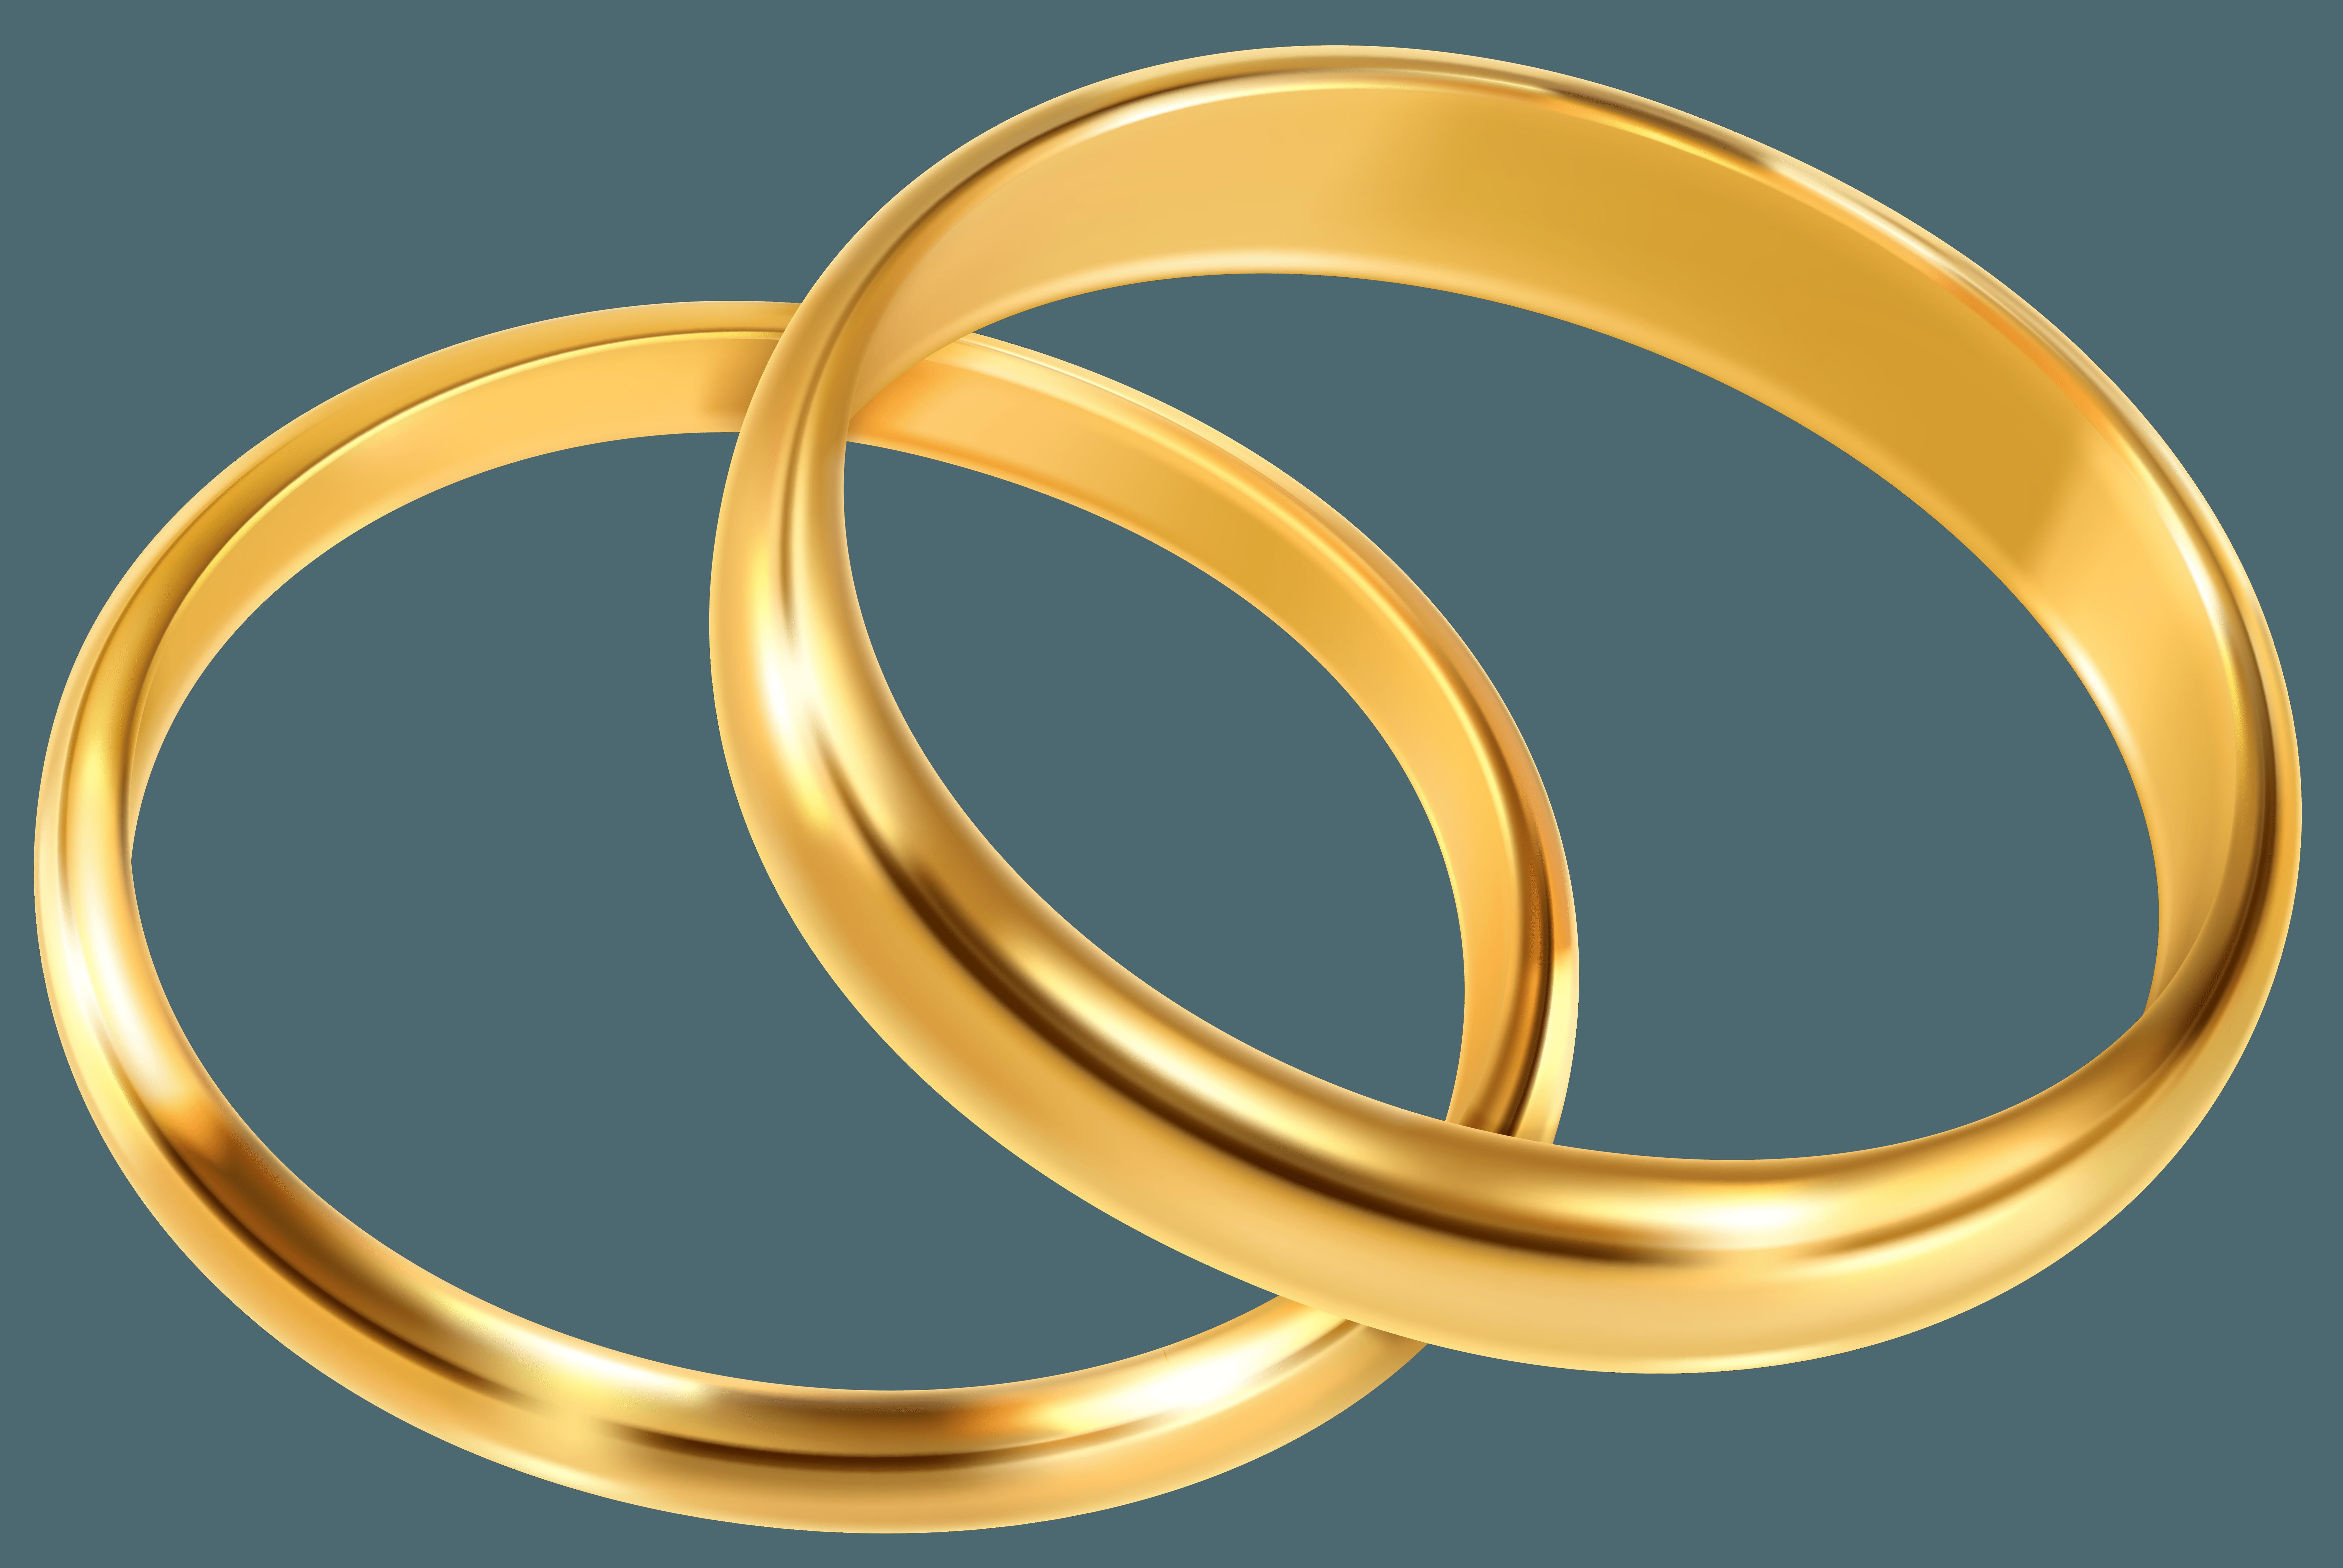 7047x4717 Wedding ring clipart on clip art free wedding 2